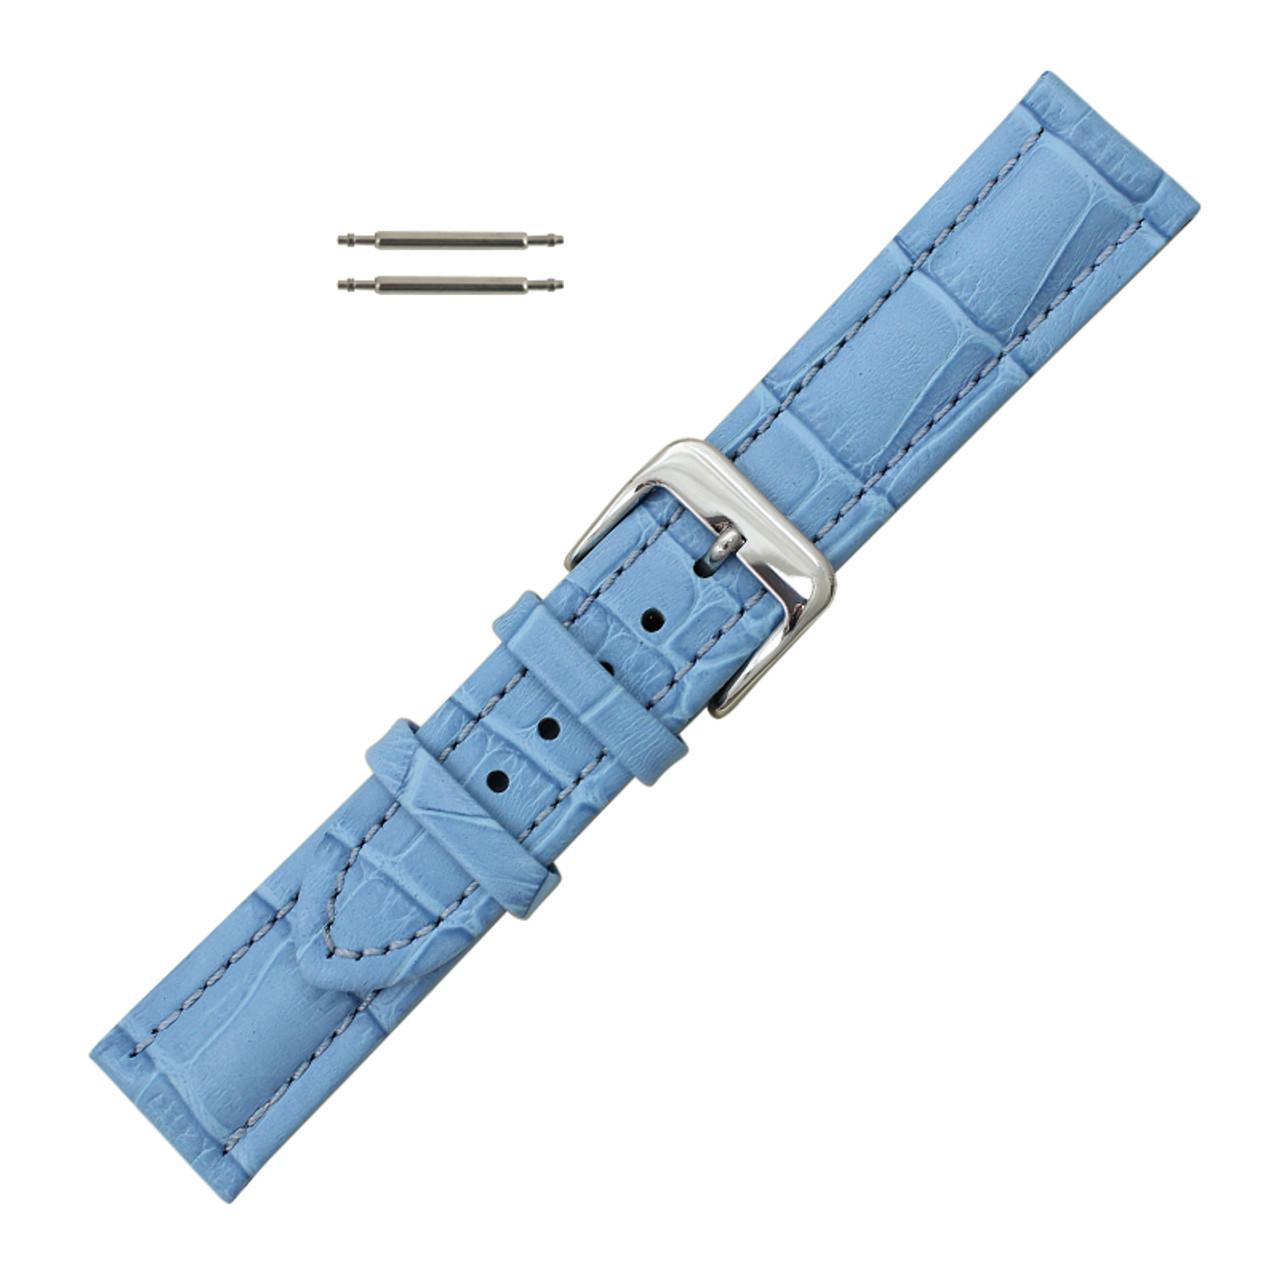 2fd65decf 20mm Light Blue Leather Watch Band - Watch Straps | Esslinger Watchbands